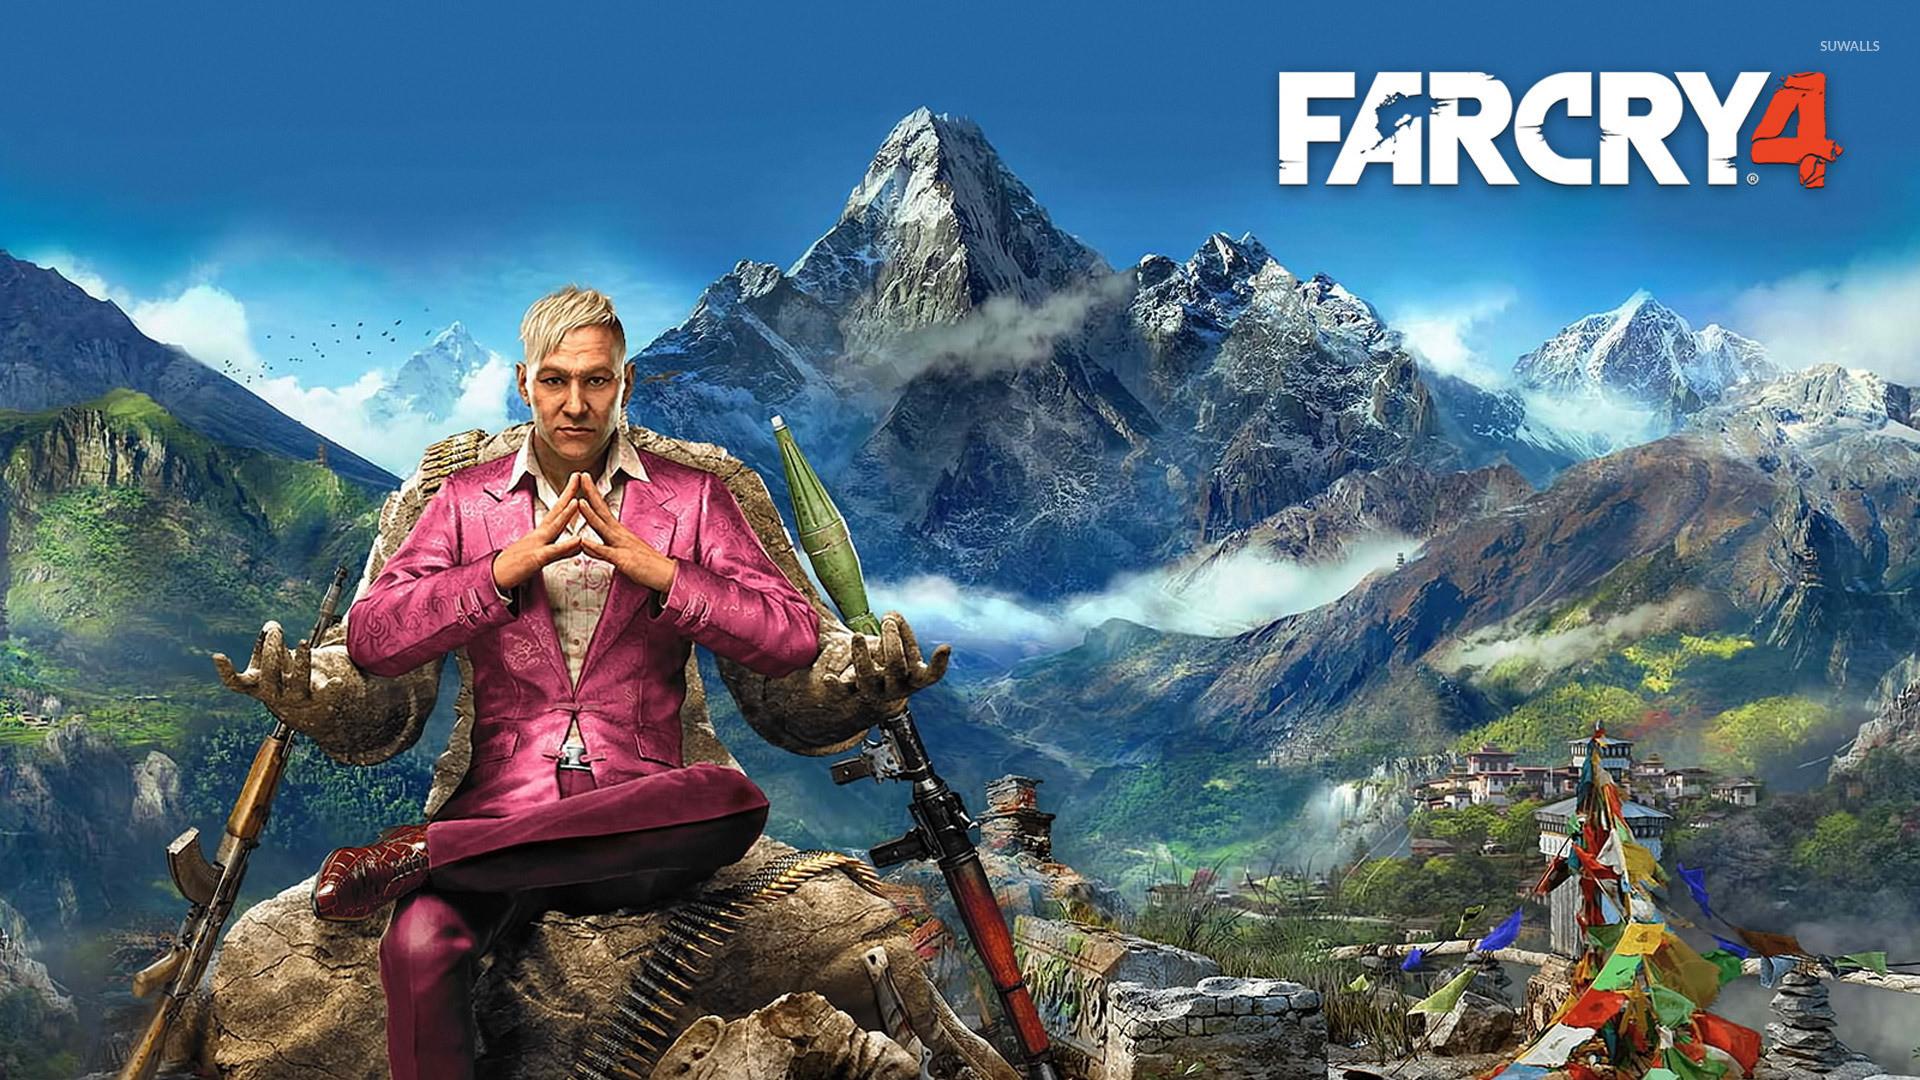 Far Cry 4 [2] wallpaper jpg